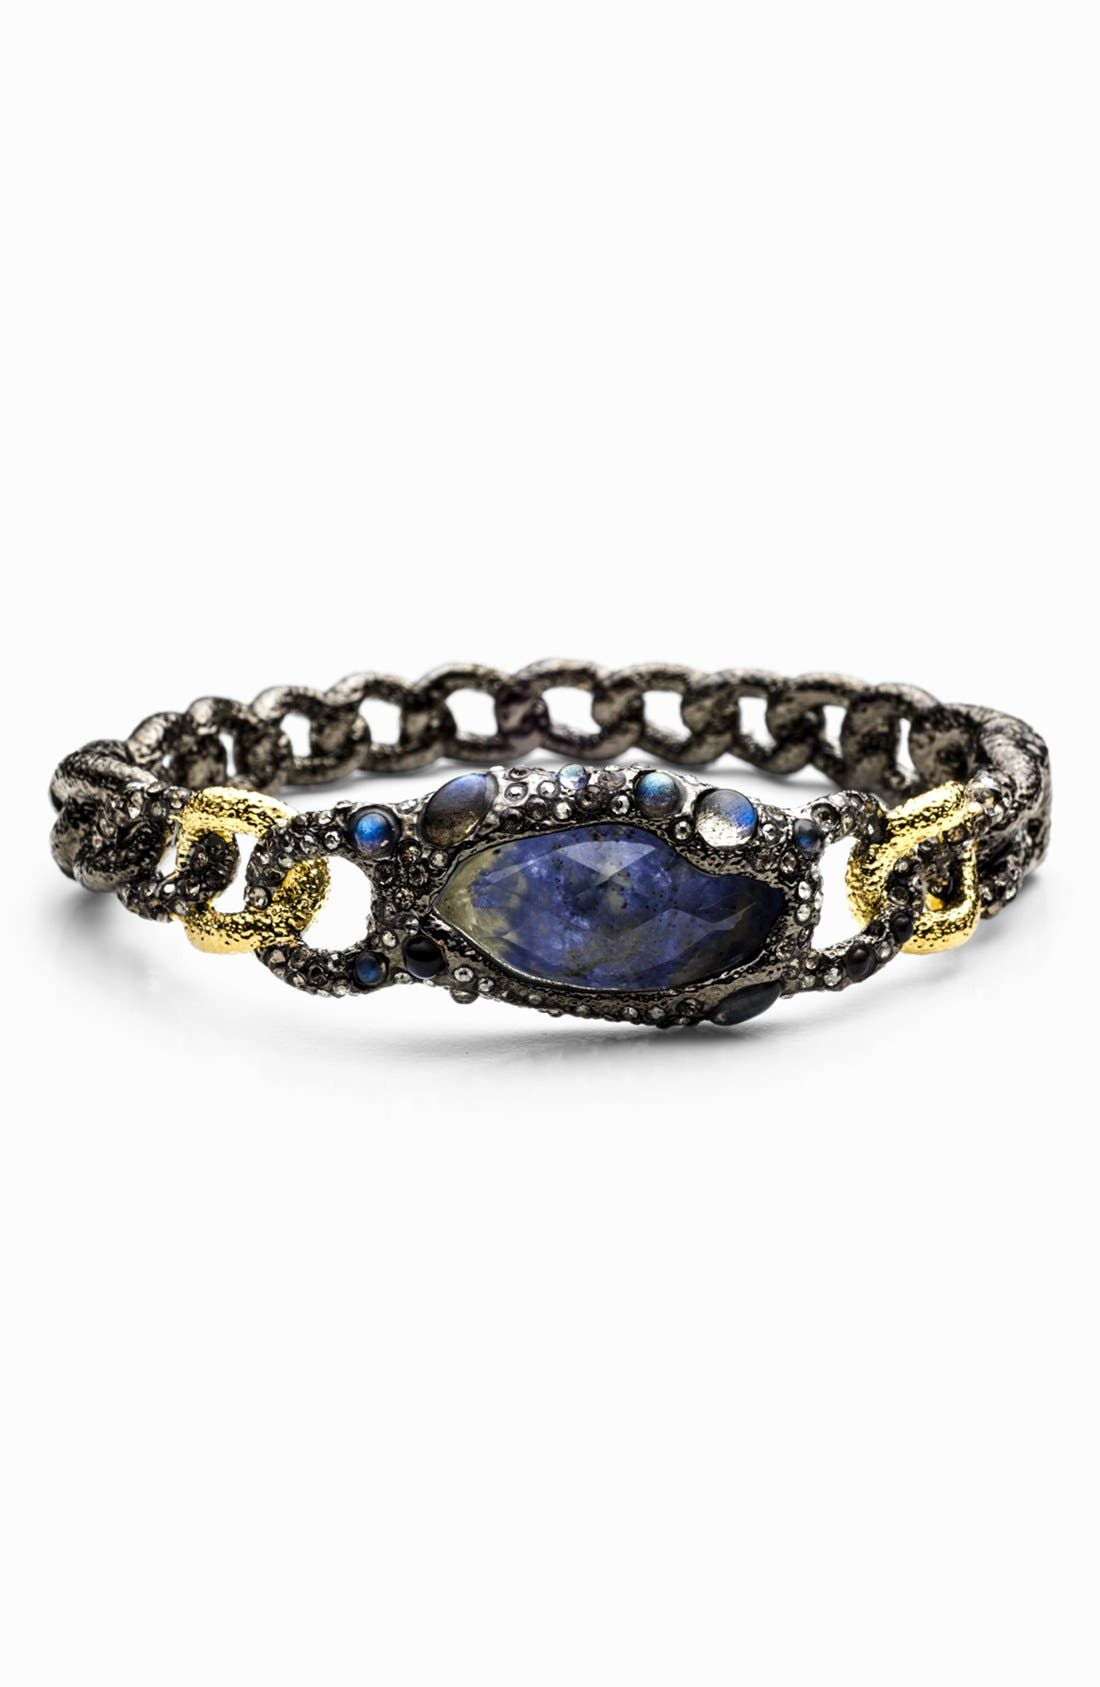 Alternate Image 1 Selected - Alexis Bittar 'Elements - Jardin de Papillon' Hinged Bracelet